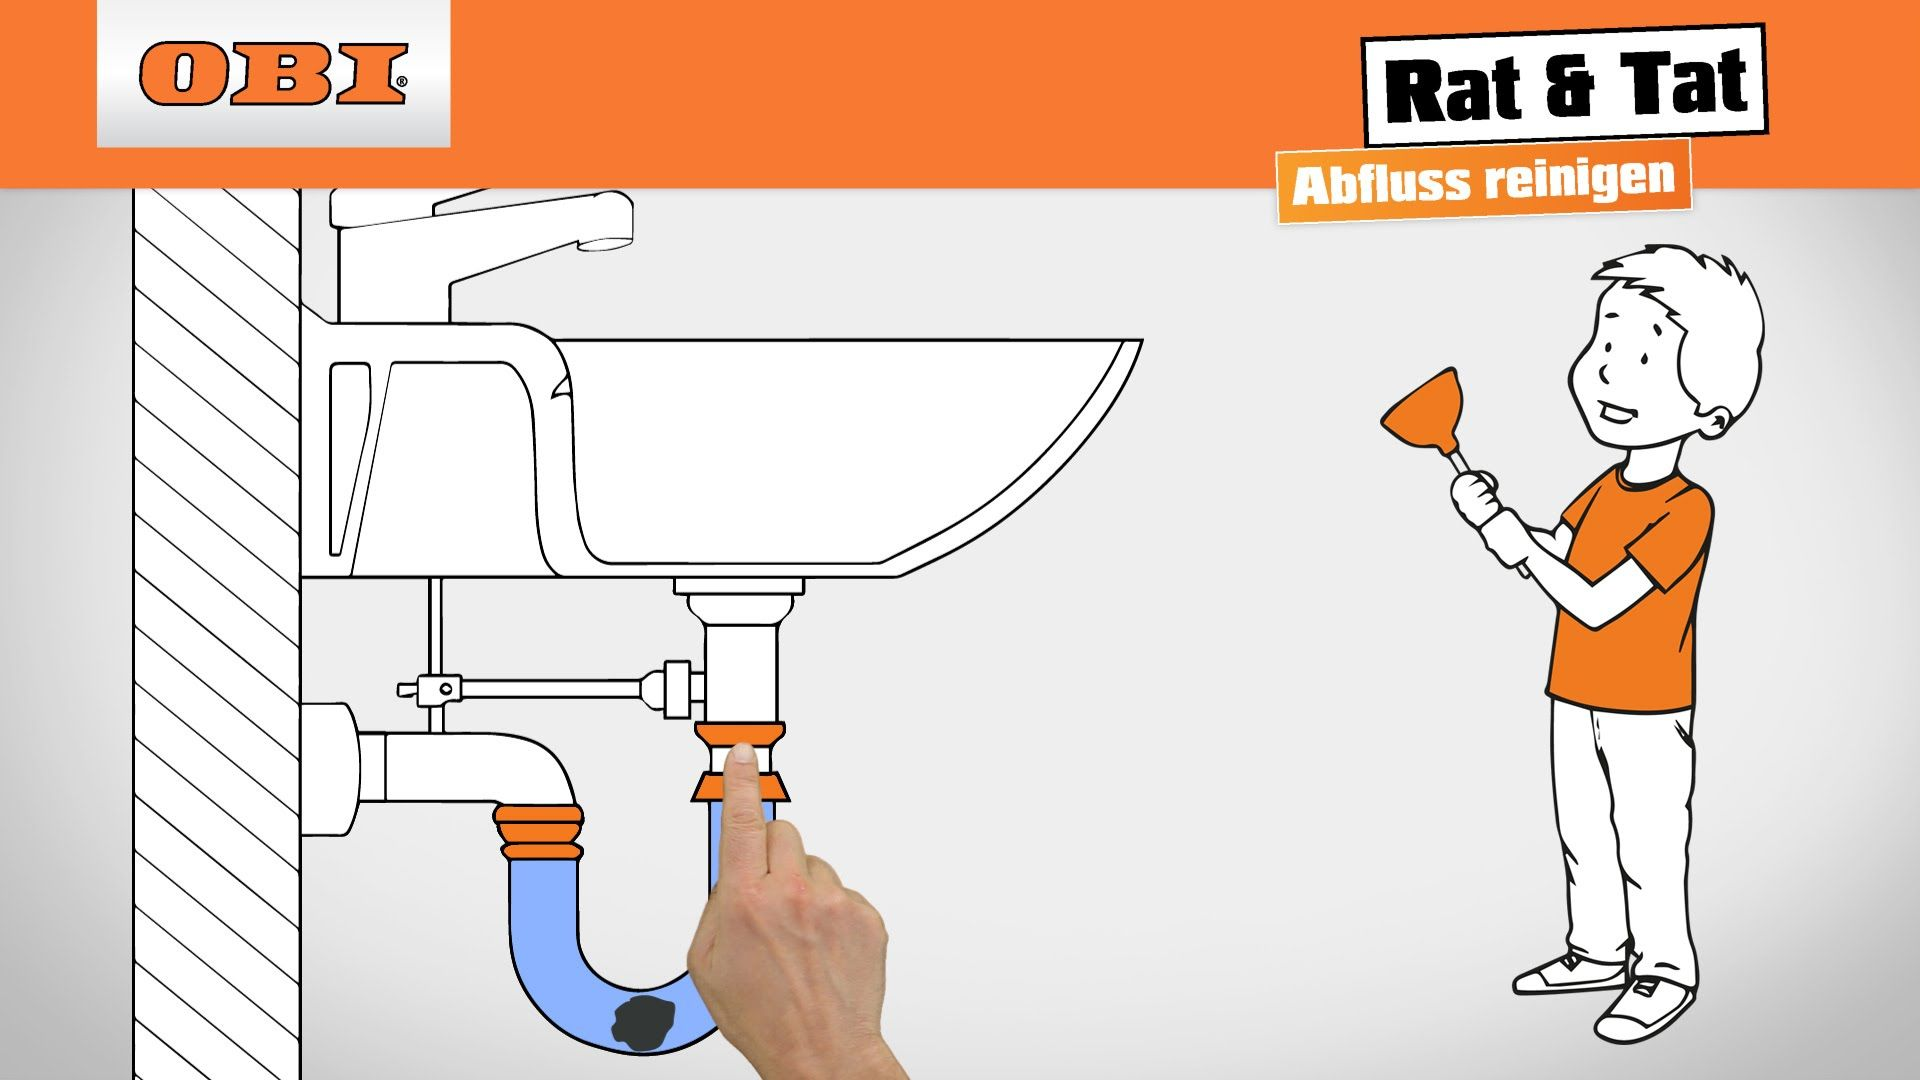 Abfluss reinigen - Rat & Tat | Renovieren & Reparieren | Pinterest ...